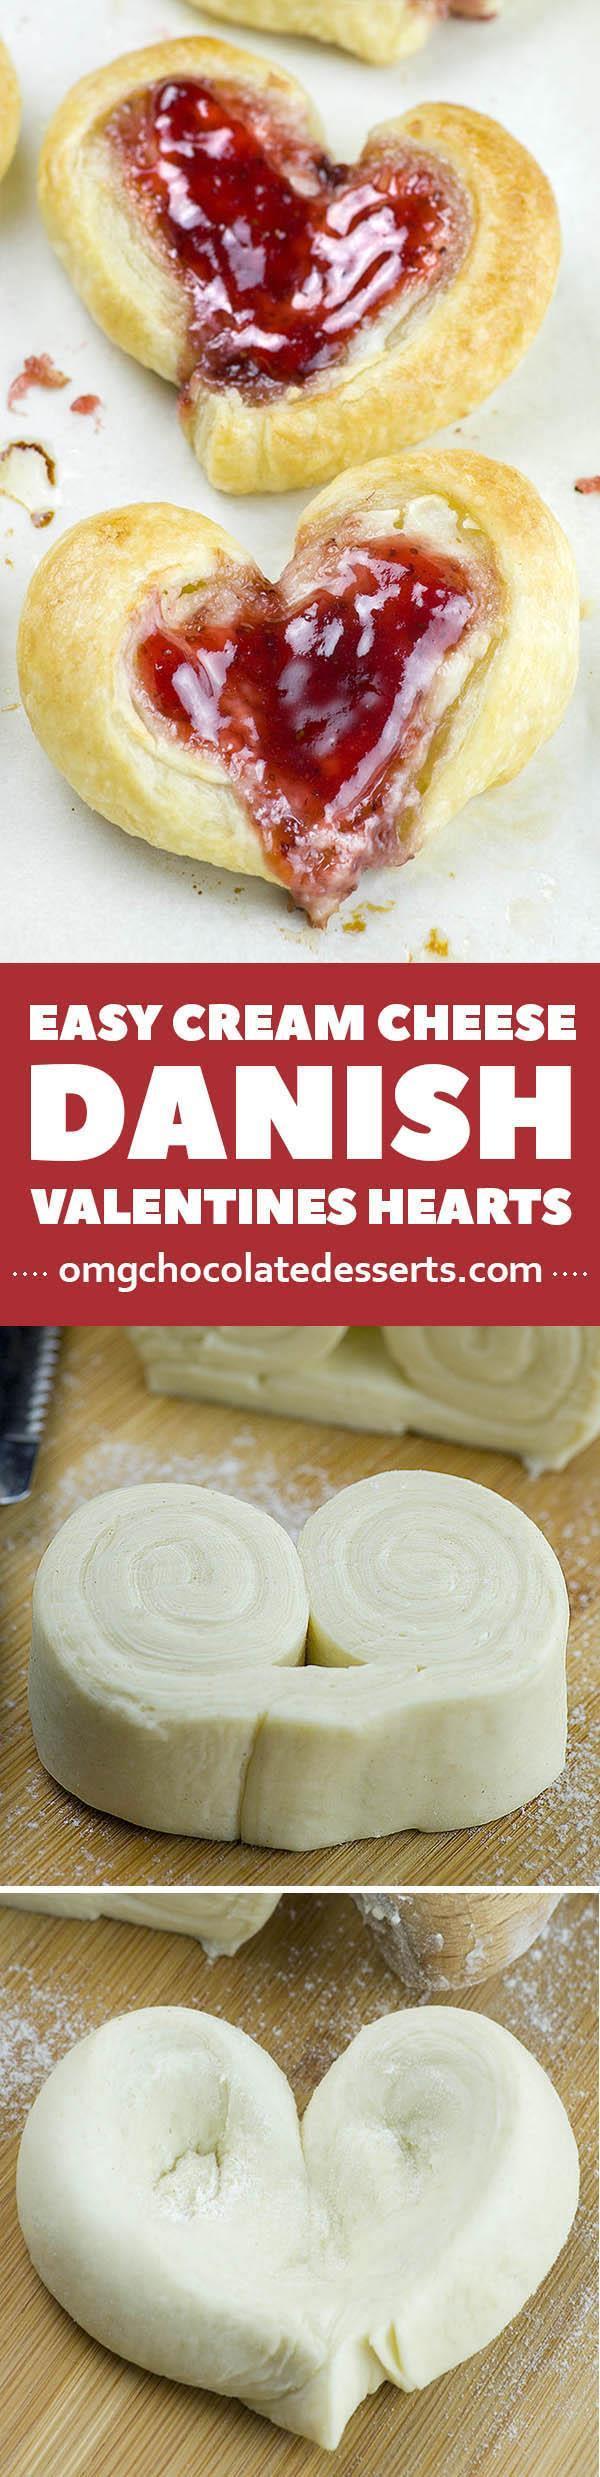 These adorable Easy Cream Cheese Danish Valentine's Hearts are perfect Valentines breakfast idea.